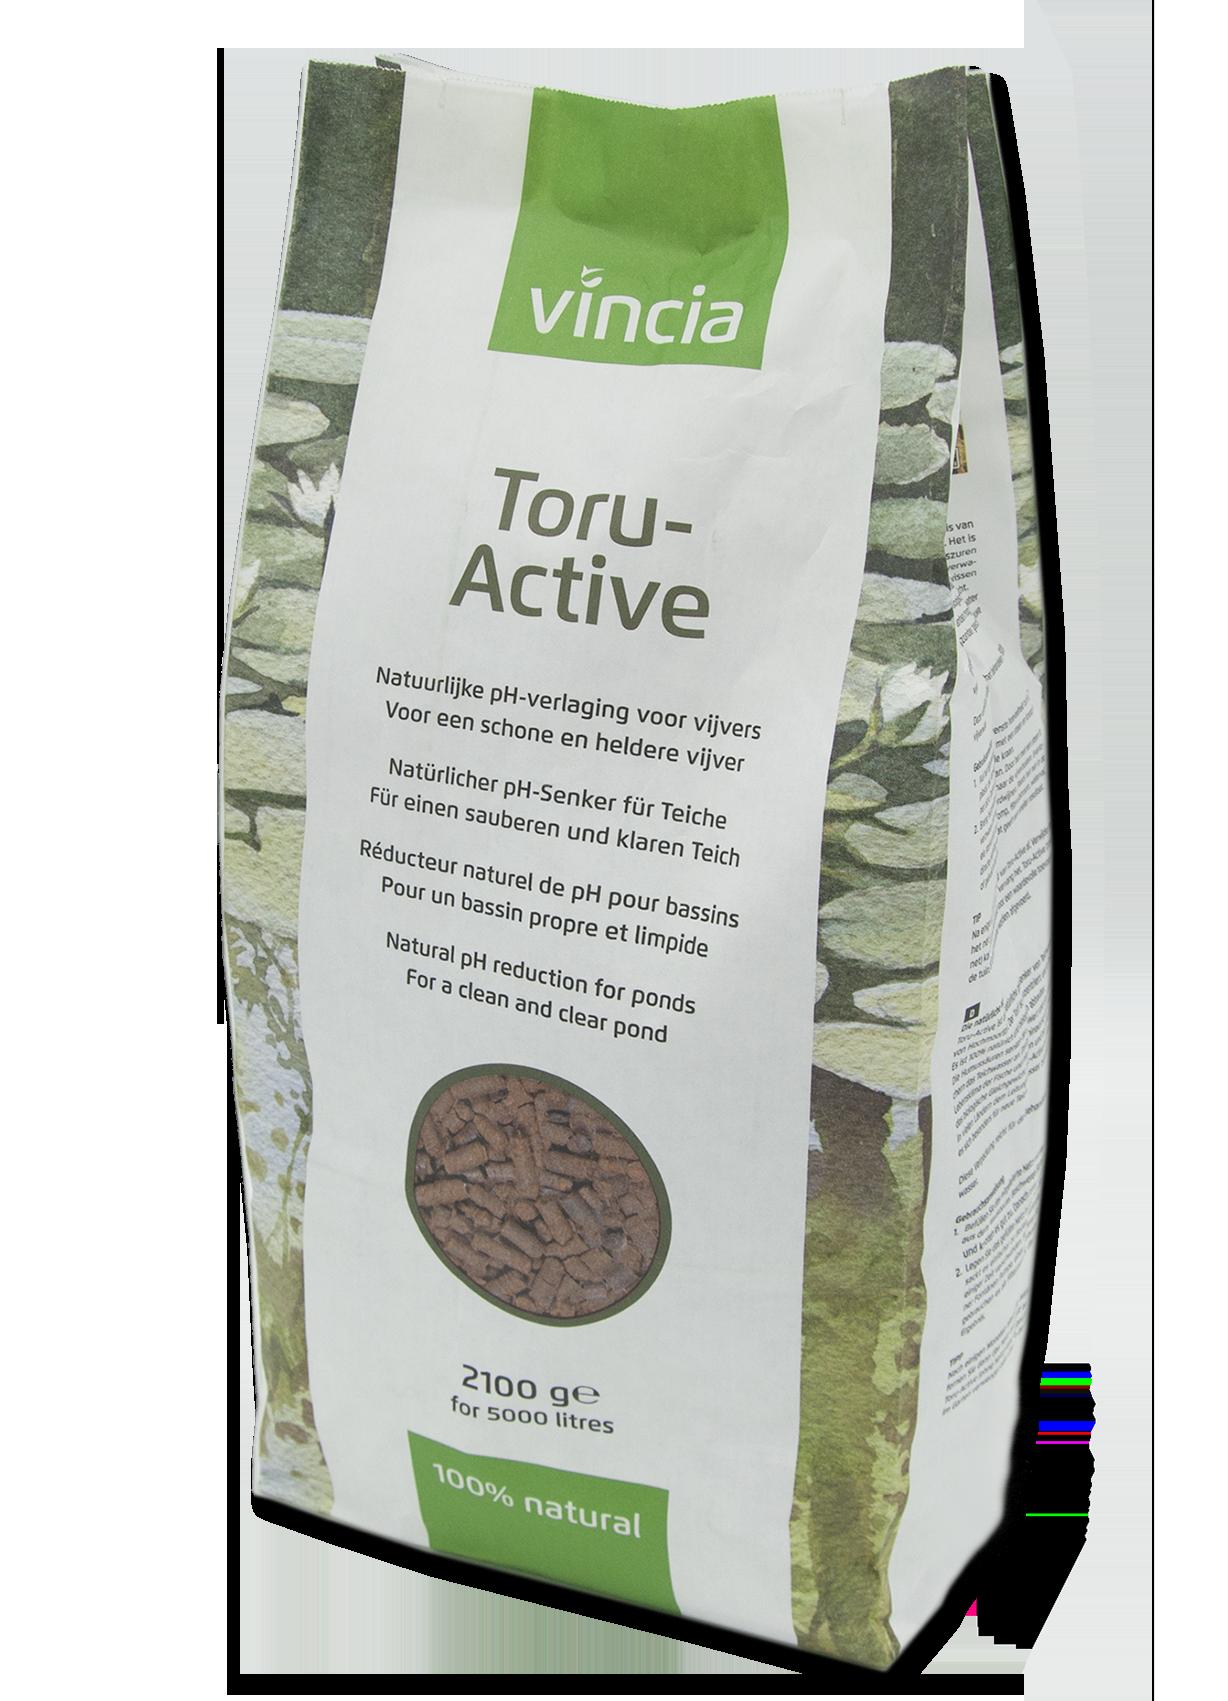 Vincia Toru-Active - 2100 Gram | Velda kopen